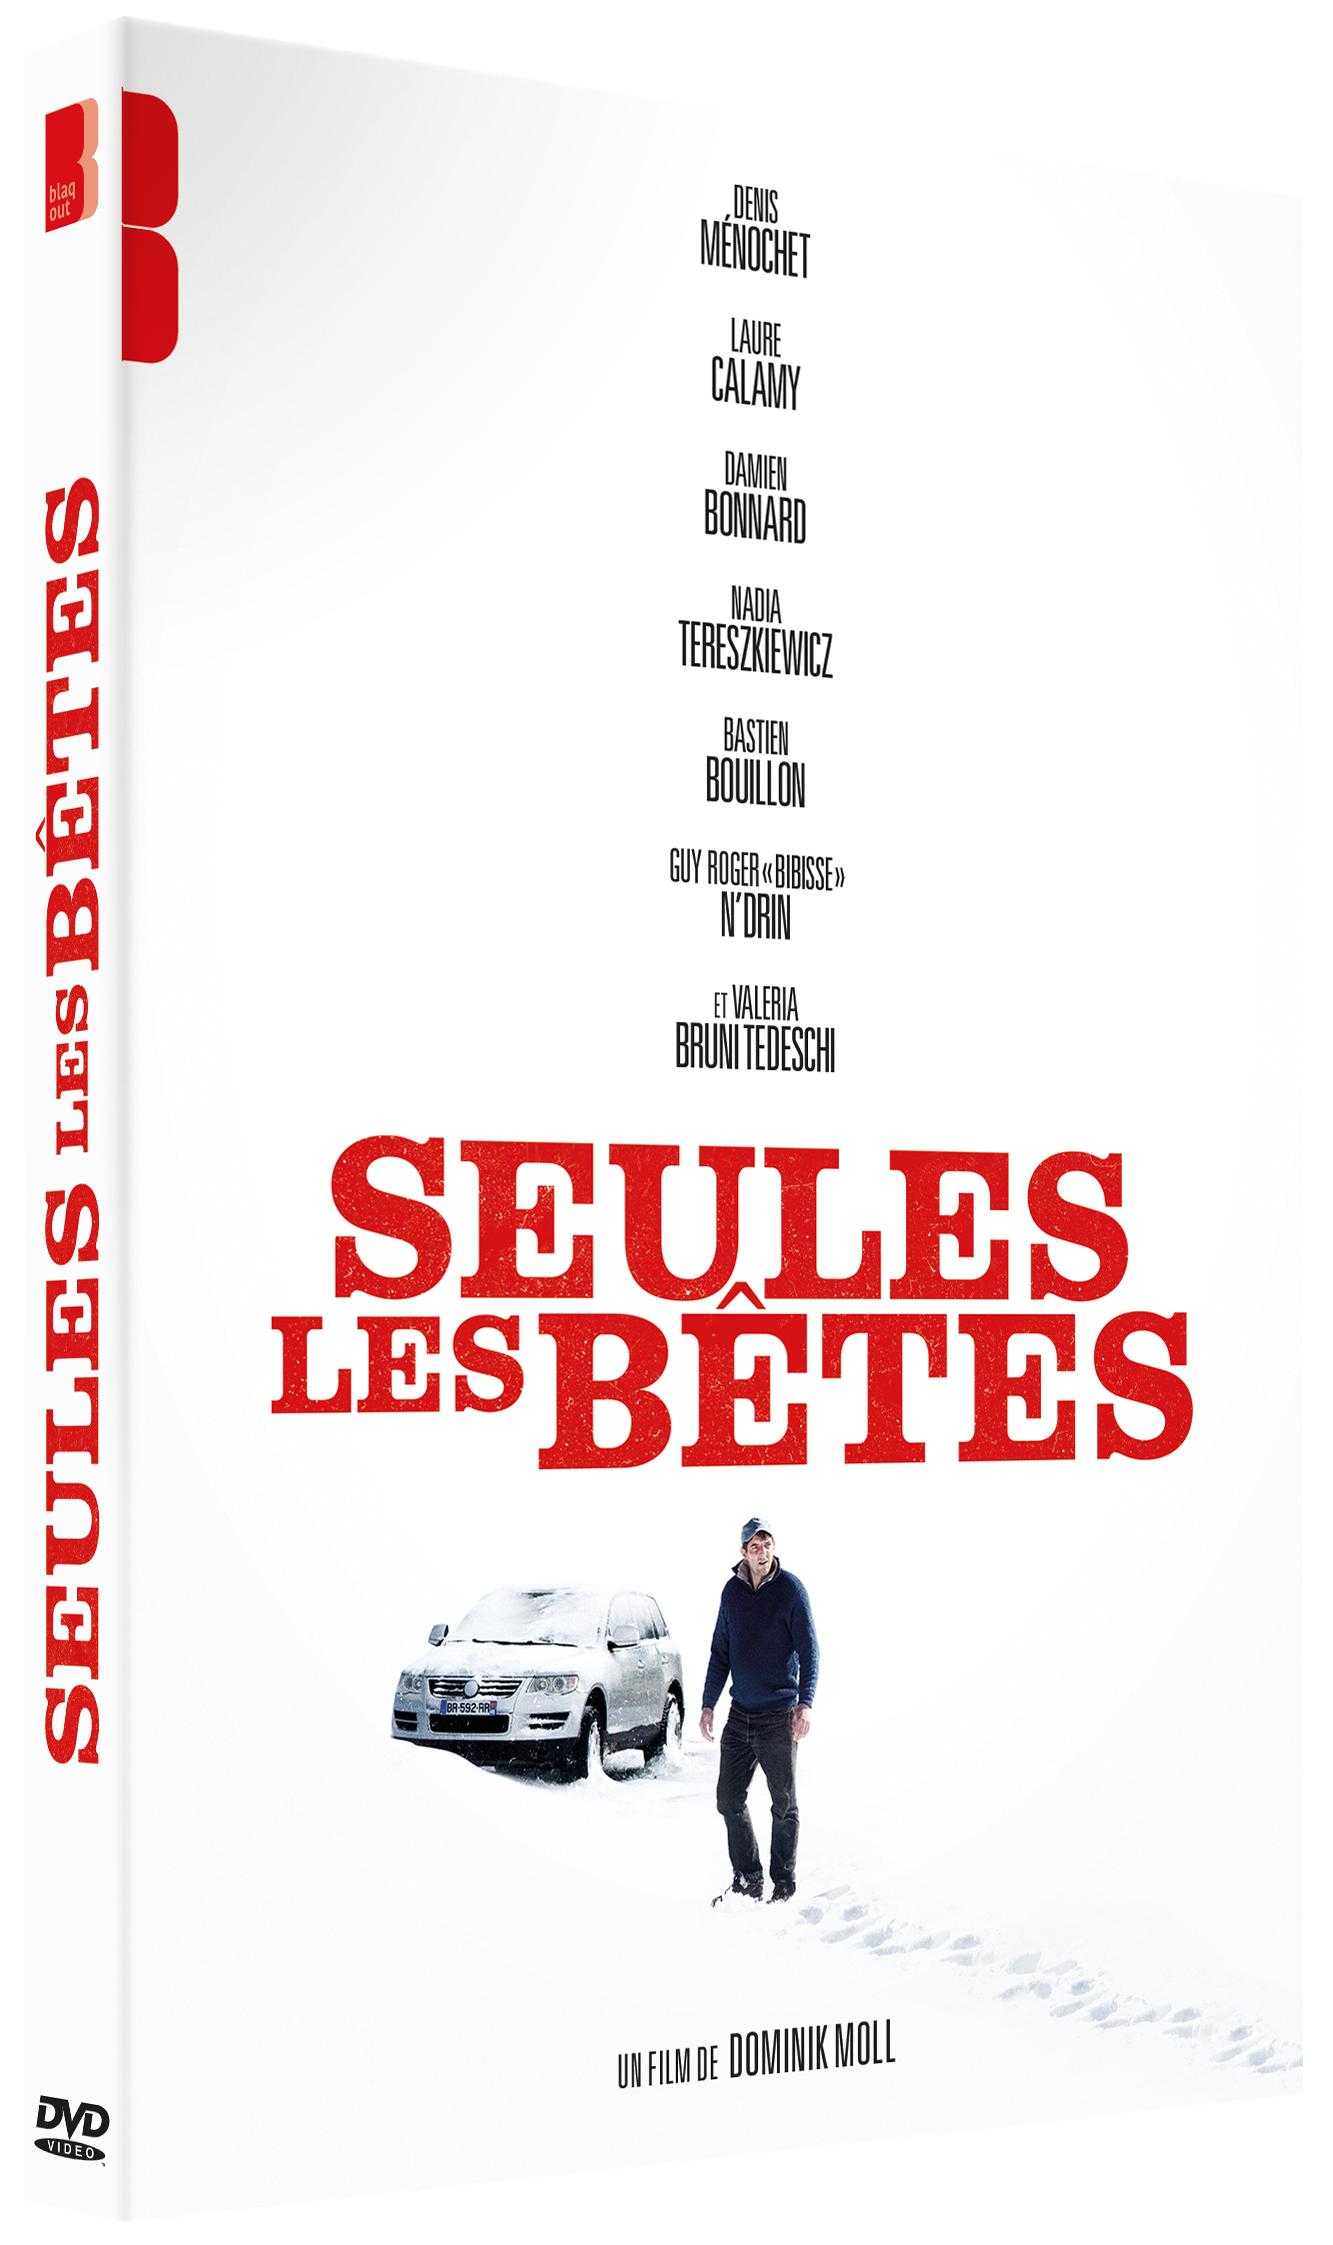 SEULES LES BETES